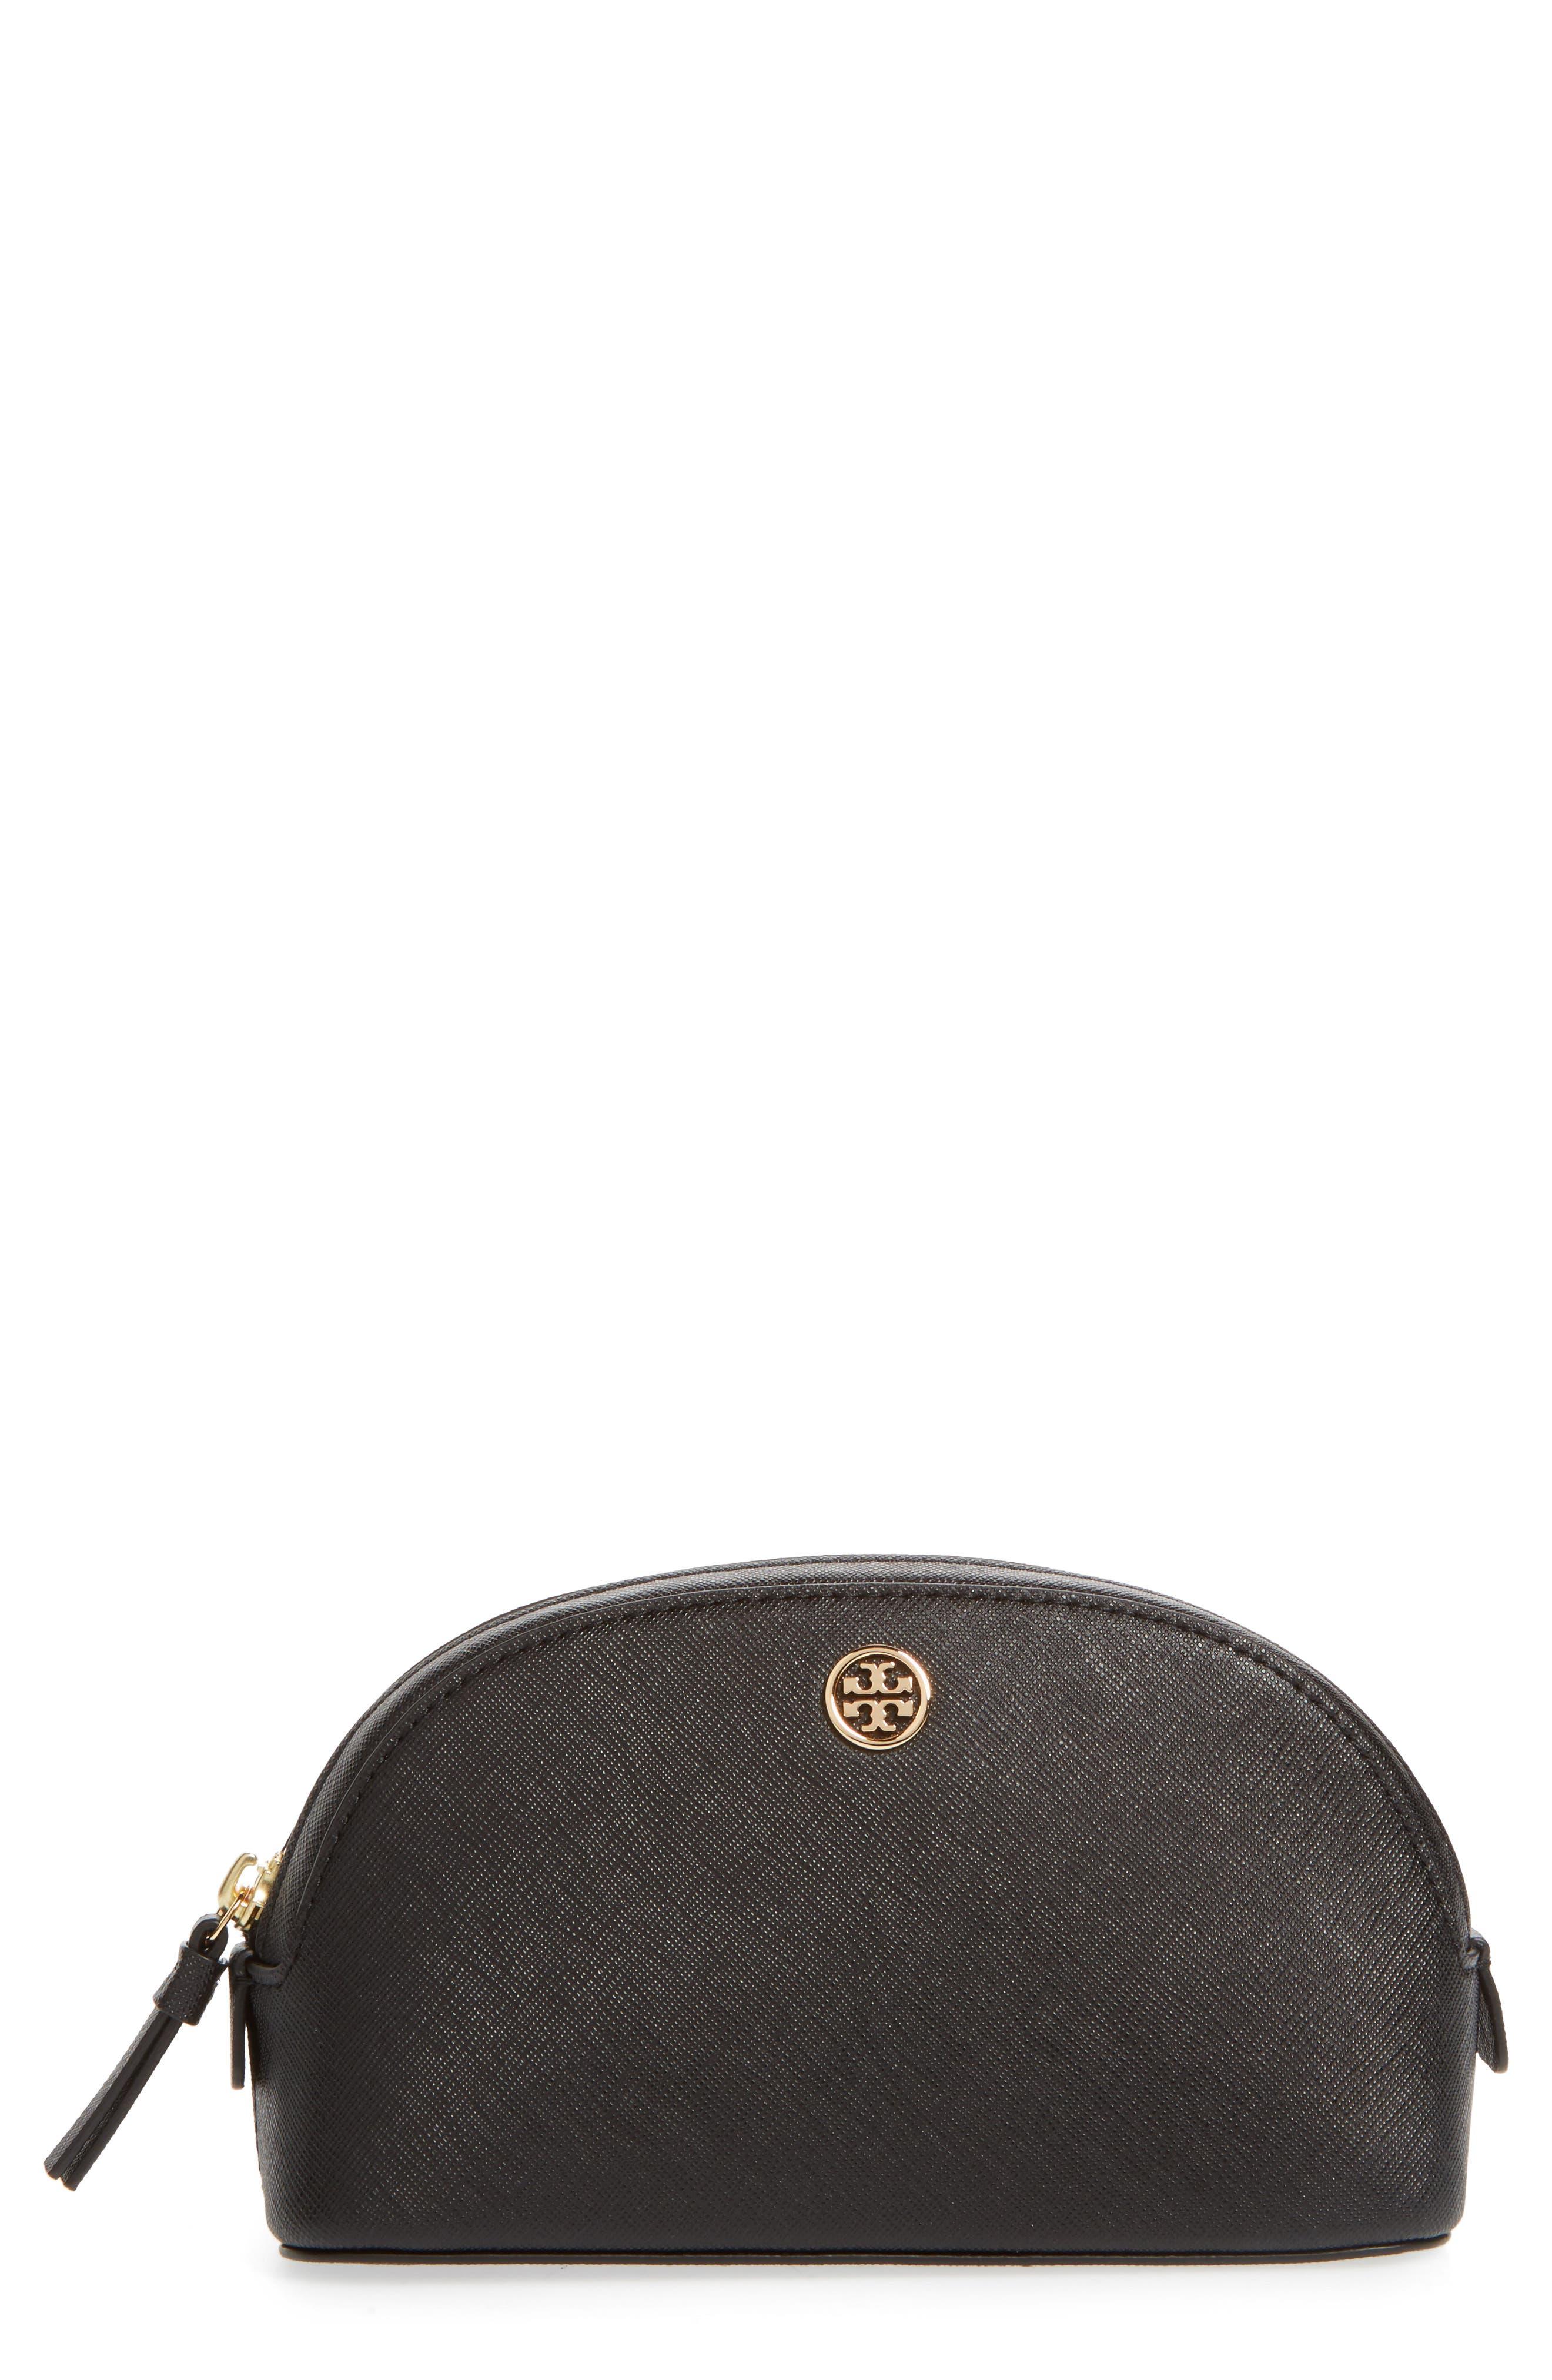 Robinson Small Leather Cosmetic Bag,                             Main thumbnail 1, color,                             BLACK / ROYAL NAVY